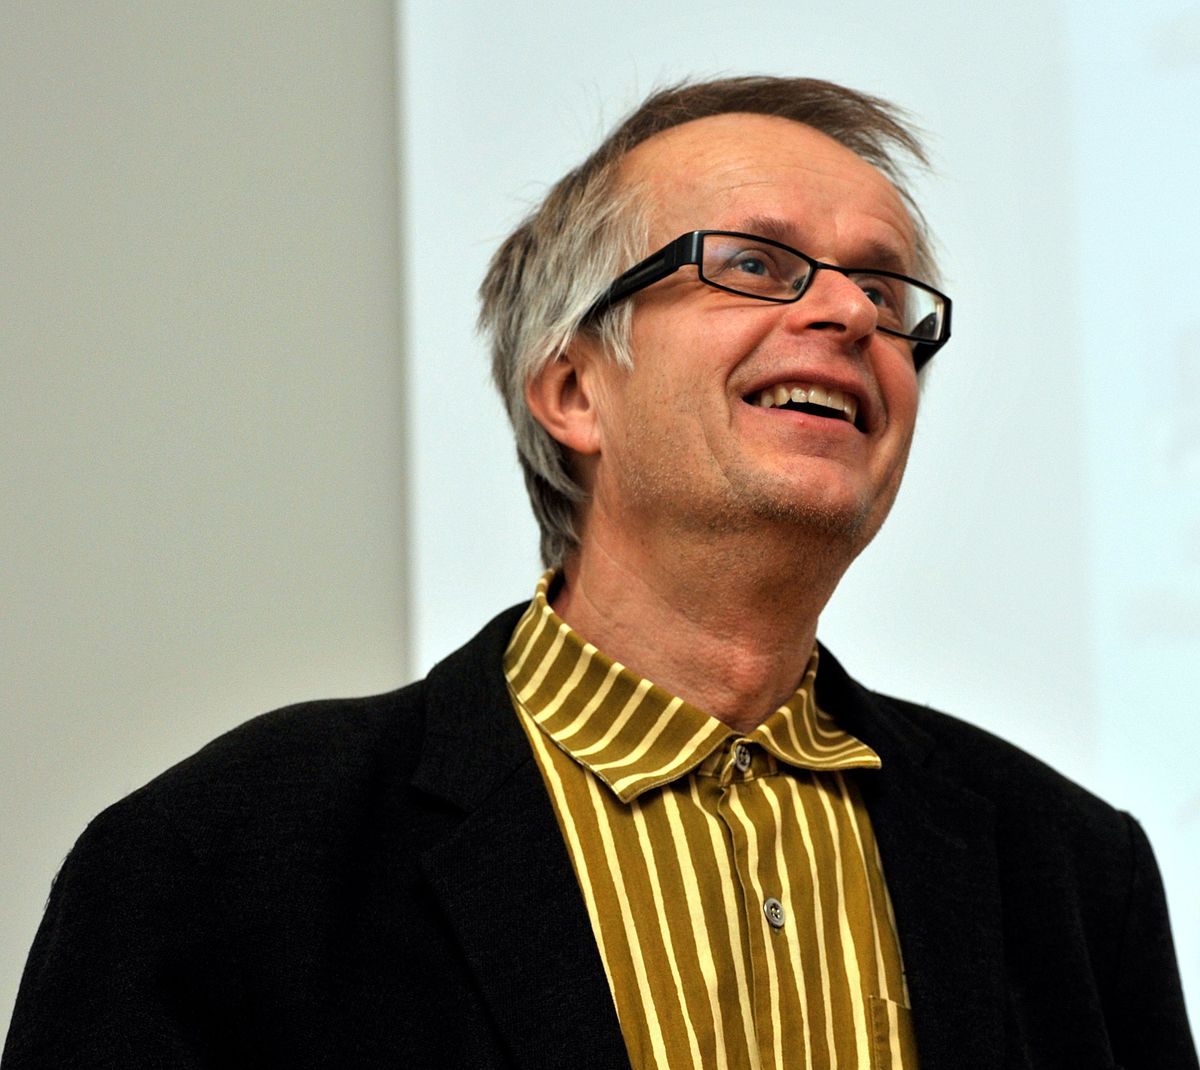 Ilkka Malmberg